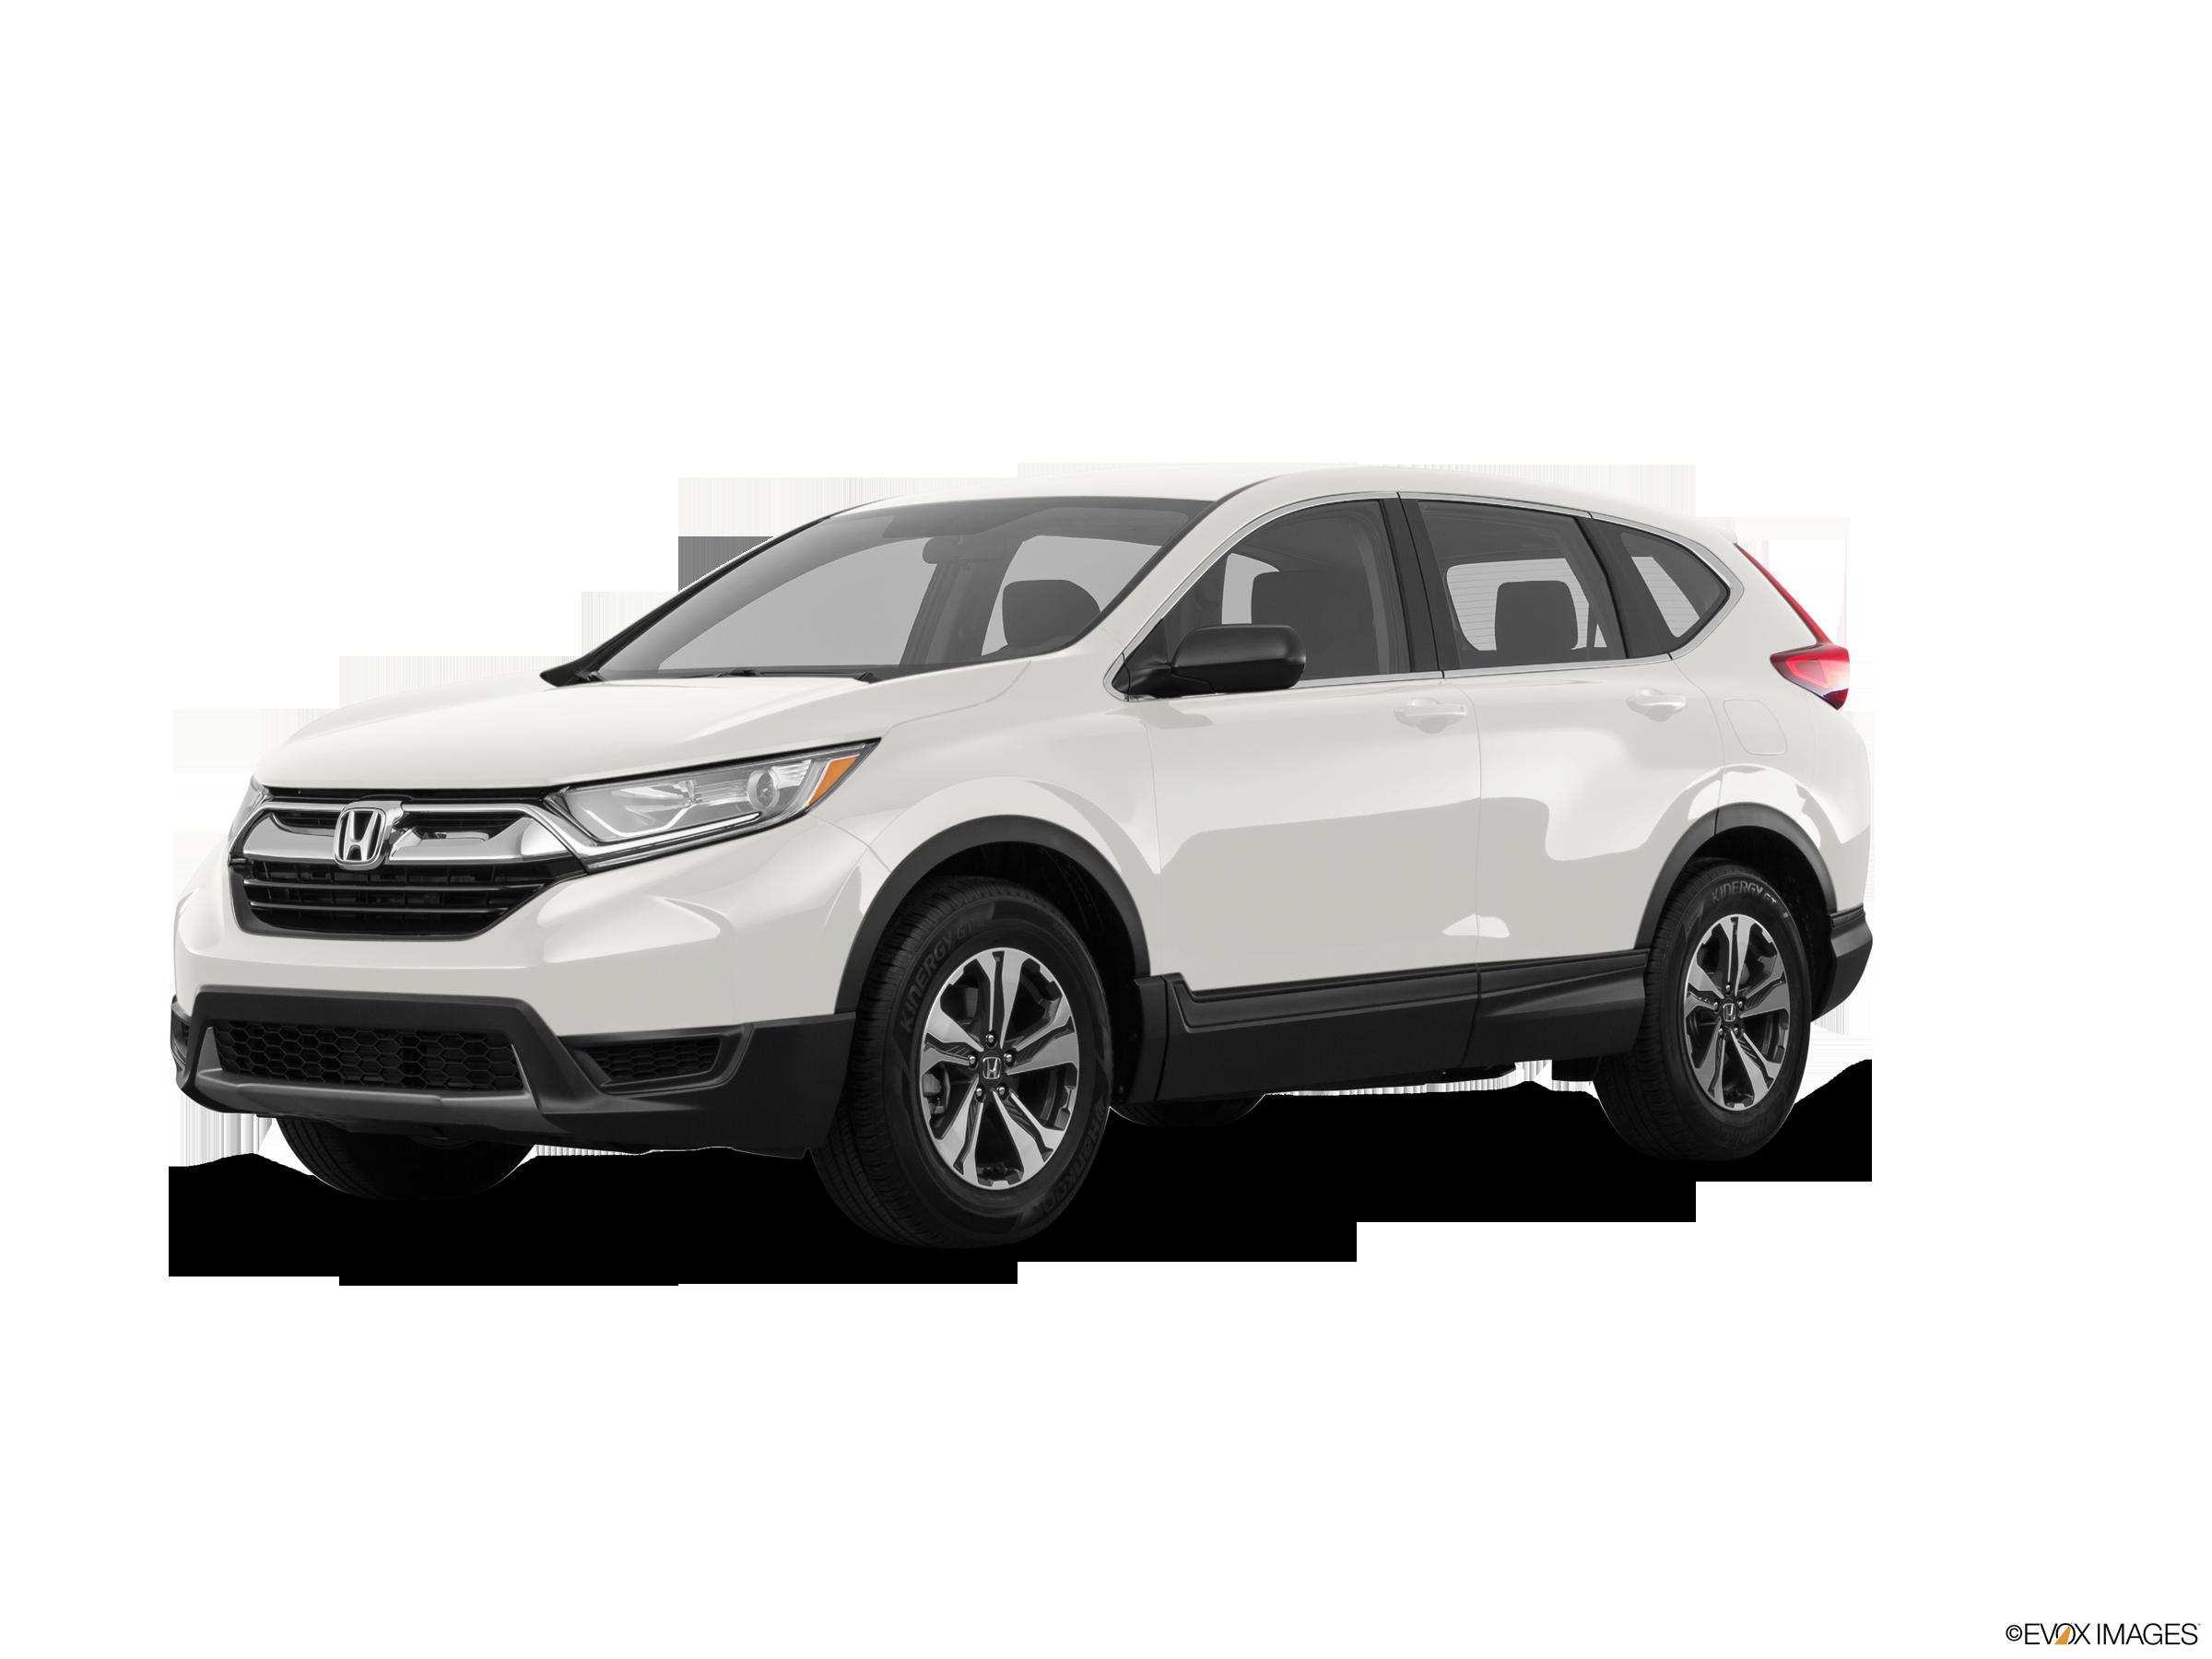 2017 Honda Cr V Values Cars For Sale Kelley Blue Book